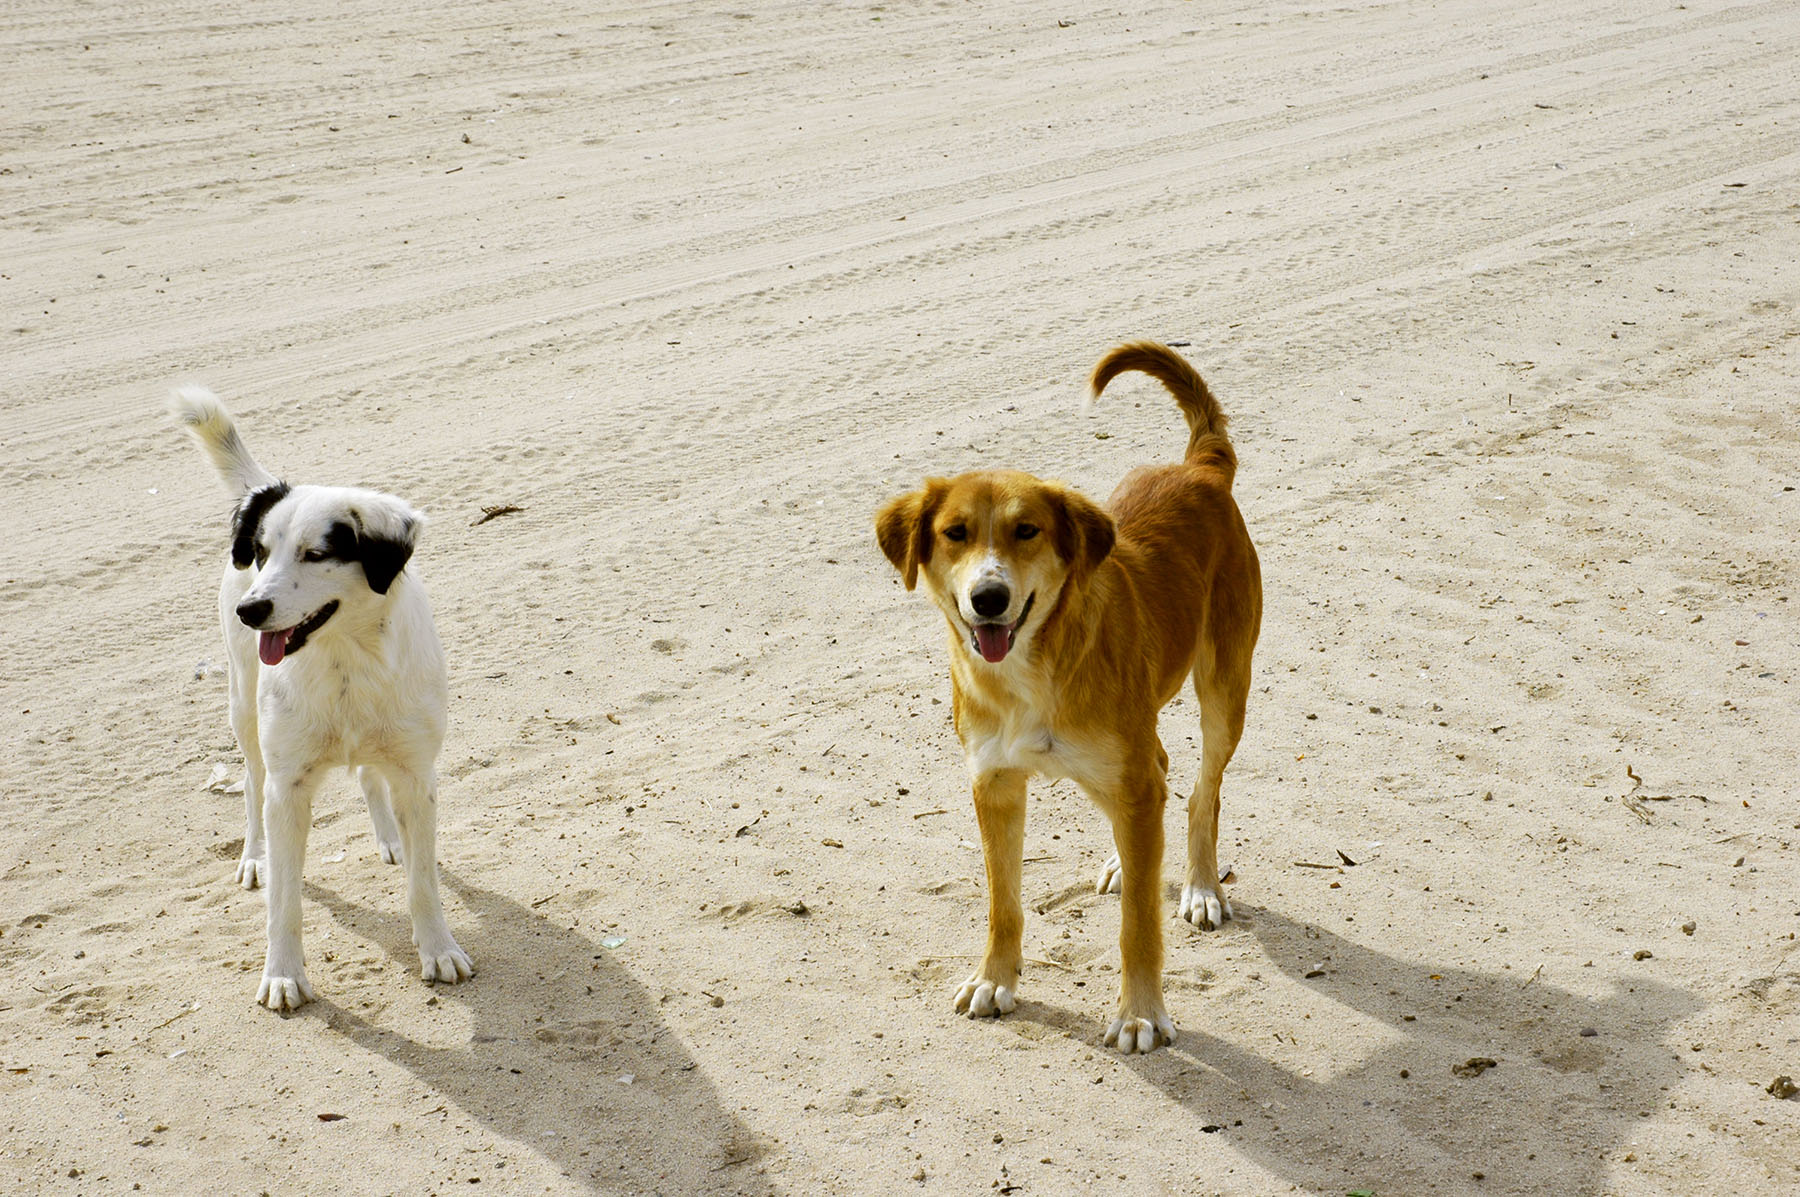 mexic0-dogs.jpg